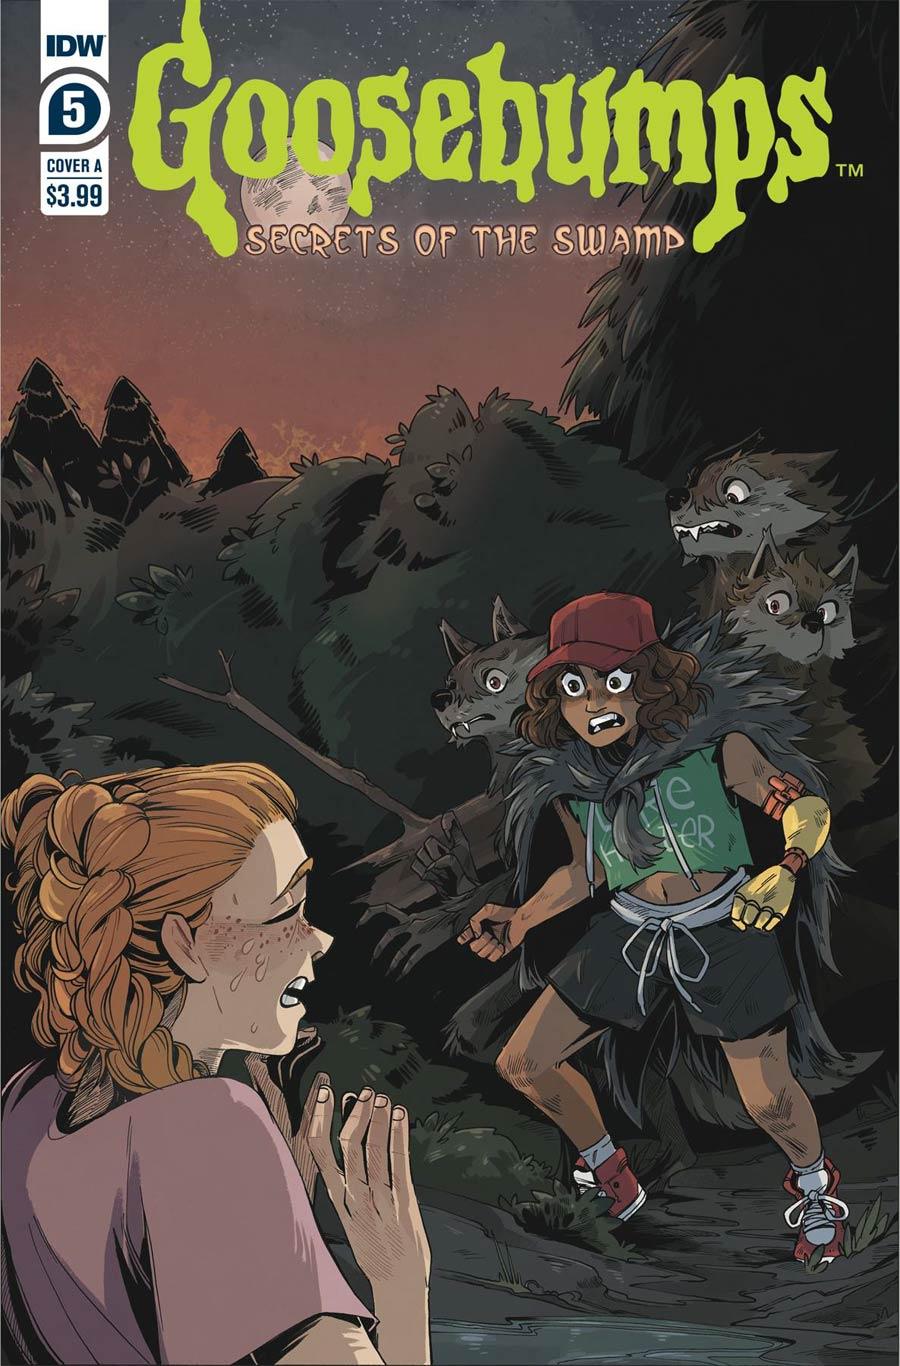 Goosebumps Secrets Of The Swamp #5 Cover A Regular Bill Underwood Cover